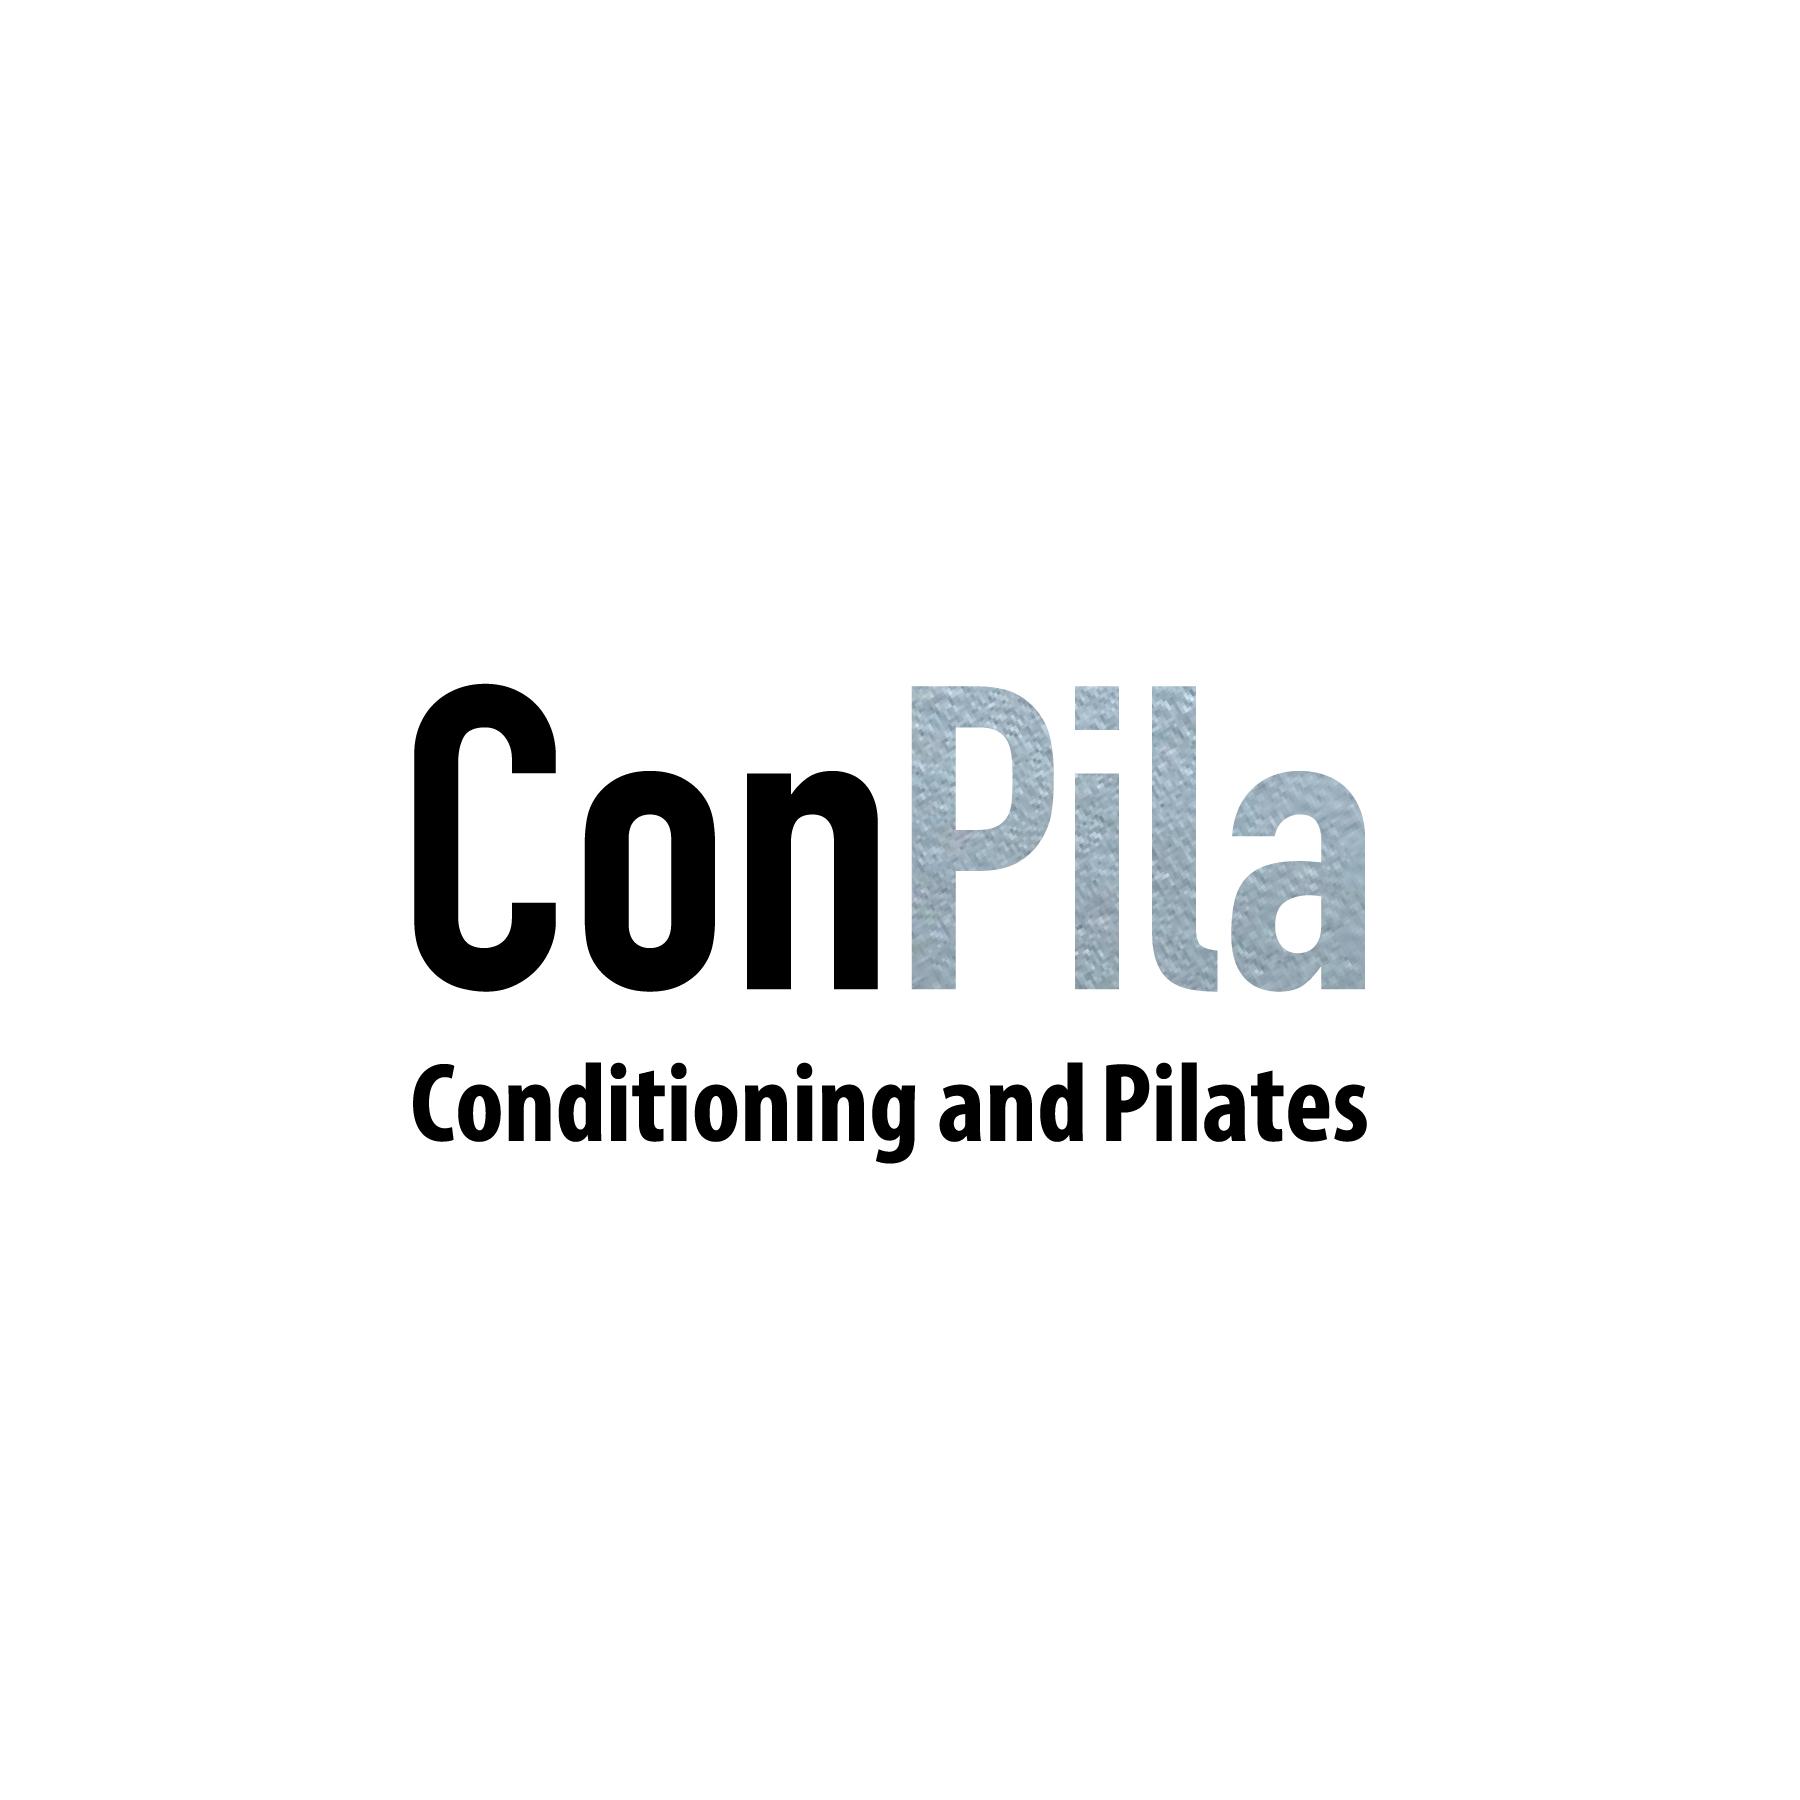 ConPila コンピラ conditioning and pilates|CI ロゴデザイン ブランドデザイン